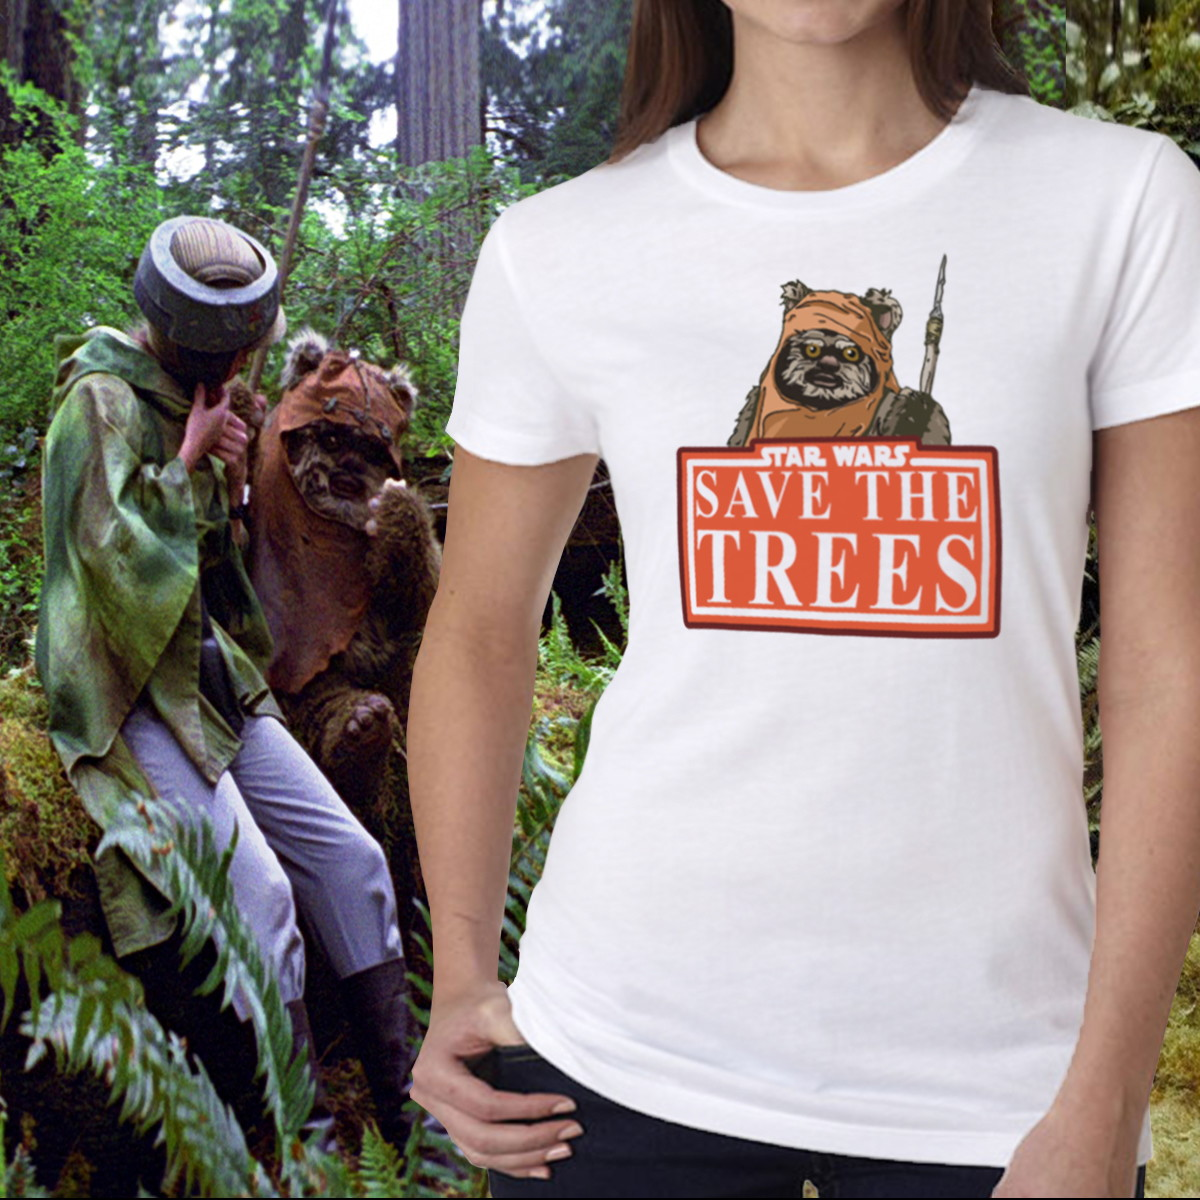 Camiseta Feminina Star Wars - Eco Ewoks no Elo7  01045986d9c7a